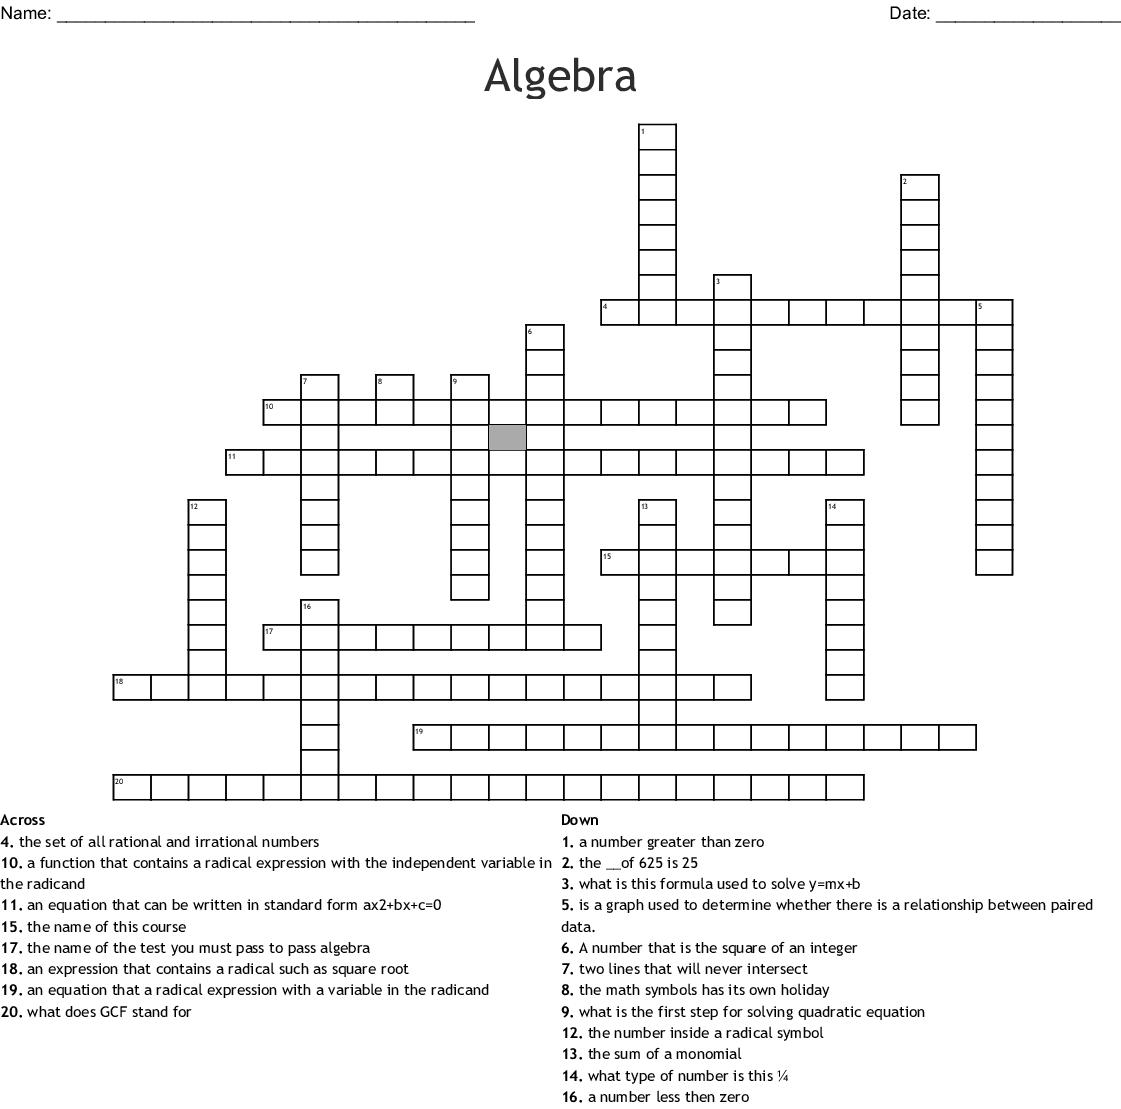 Algebra Crossword